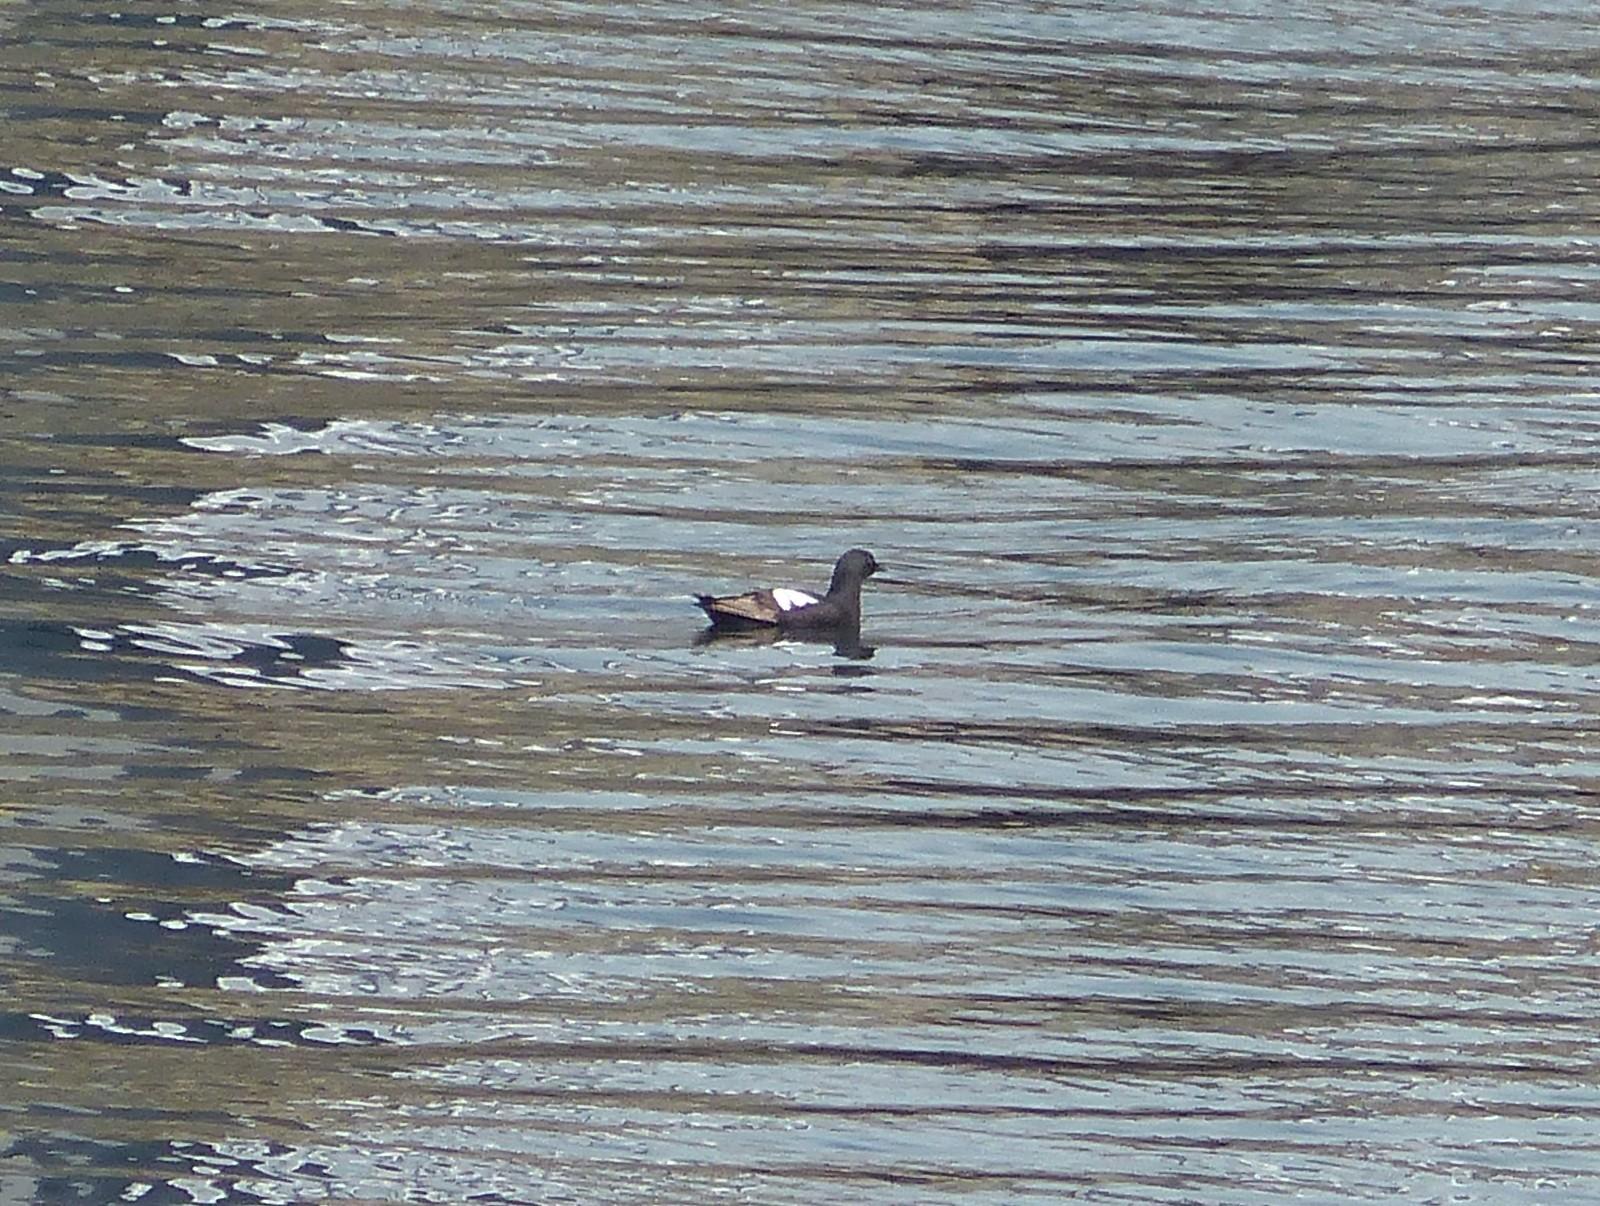 Pigeon Guillemot, Ogden Pt. Breakwater, Victoria, BC, 8-6-16, M. Long (10)